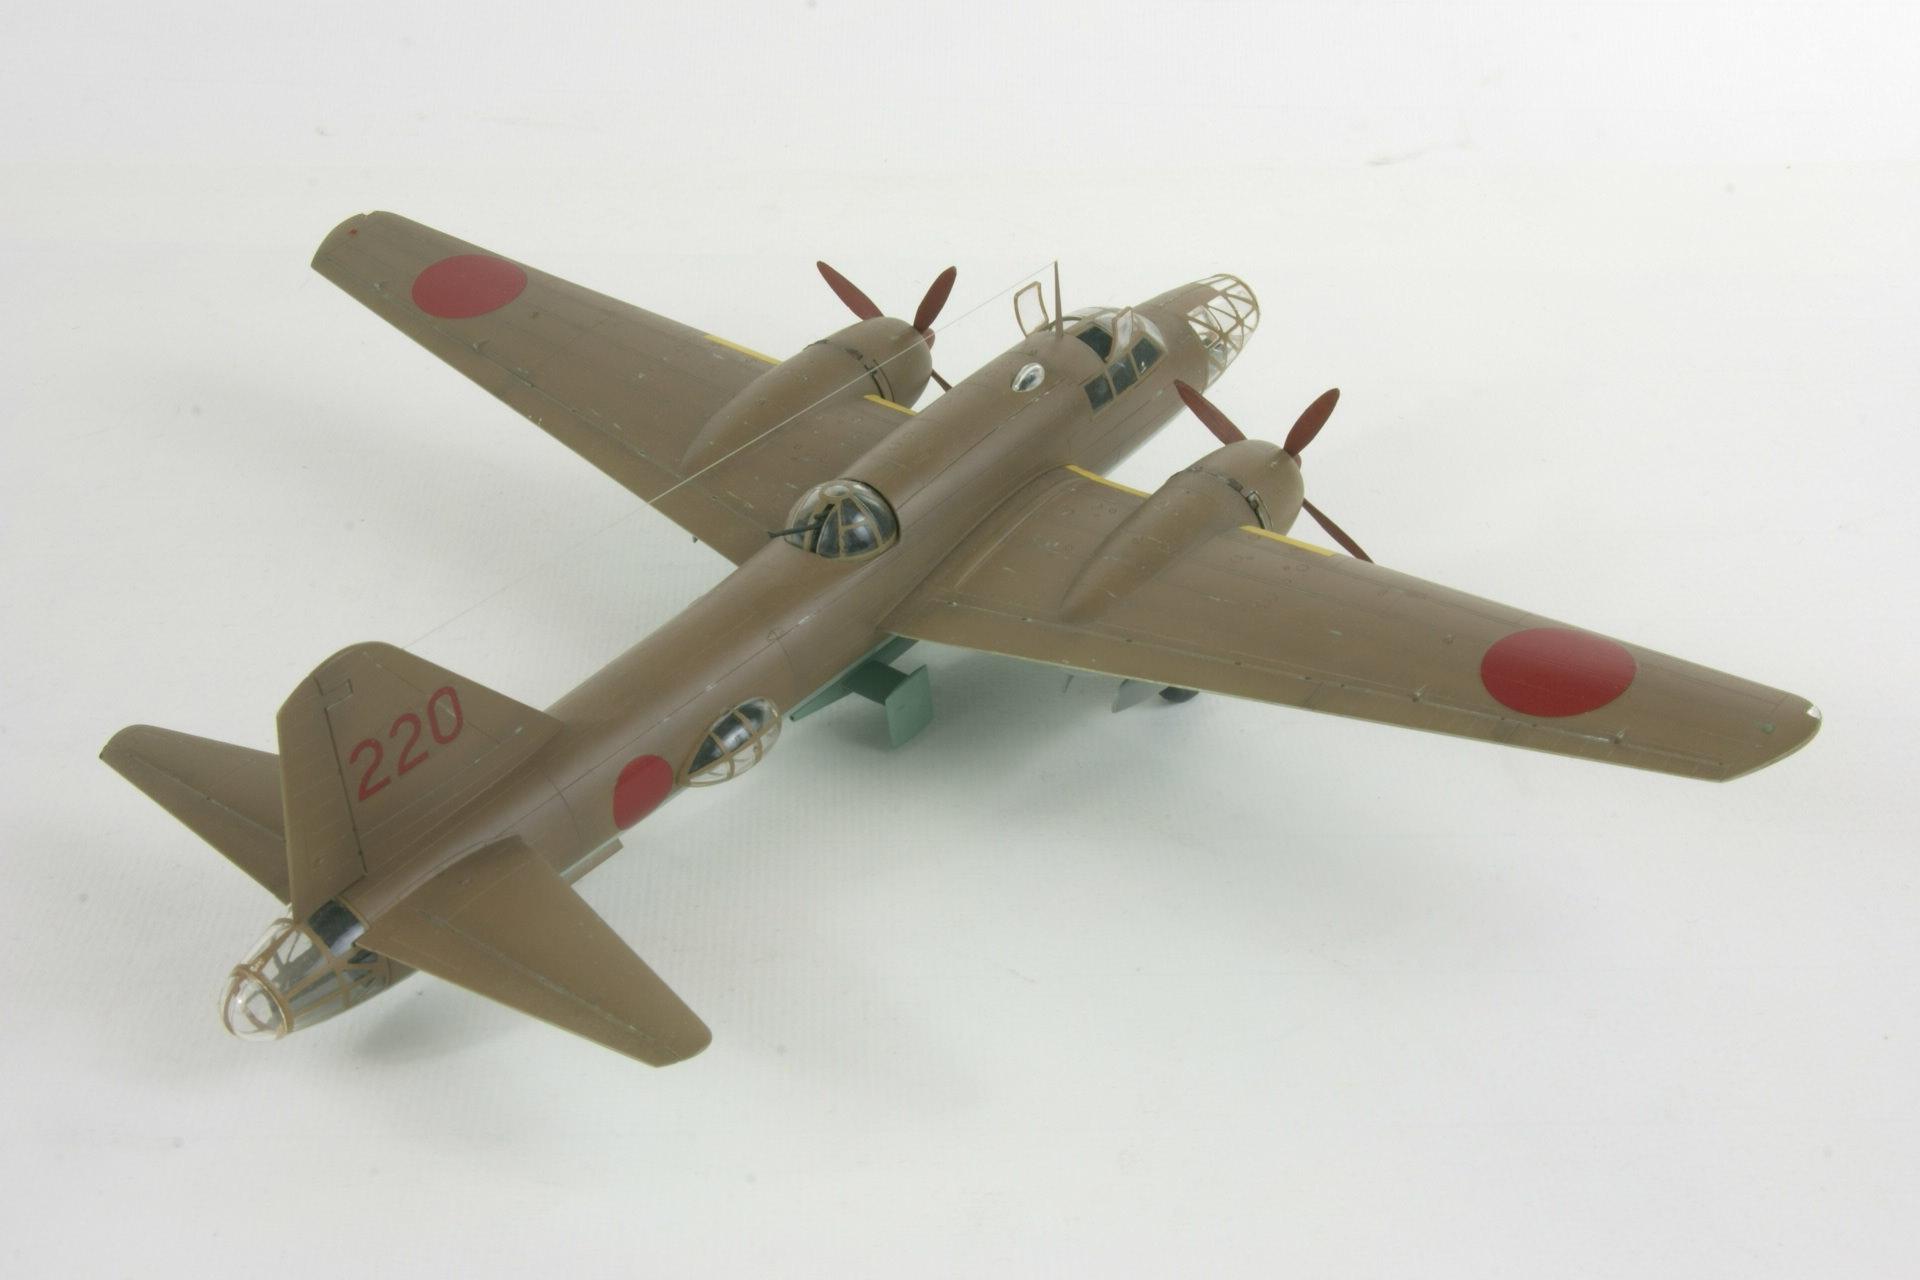 Mitsubishi ki 67 i peggy w kawasaki i go 1ko 3 1